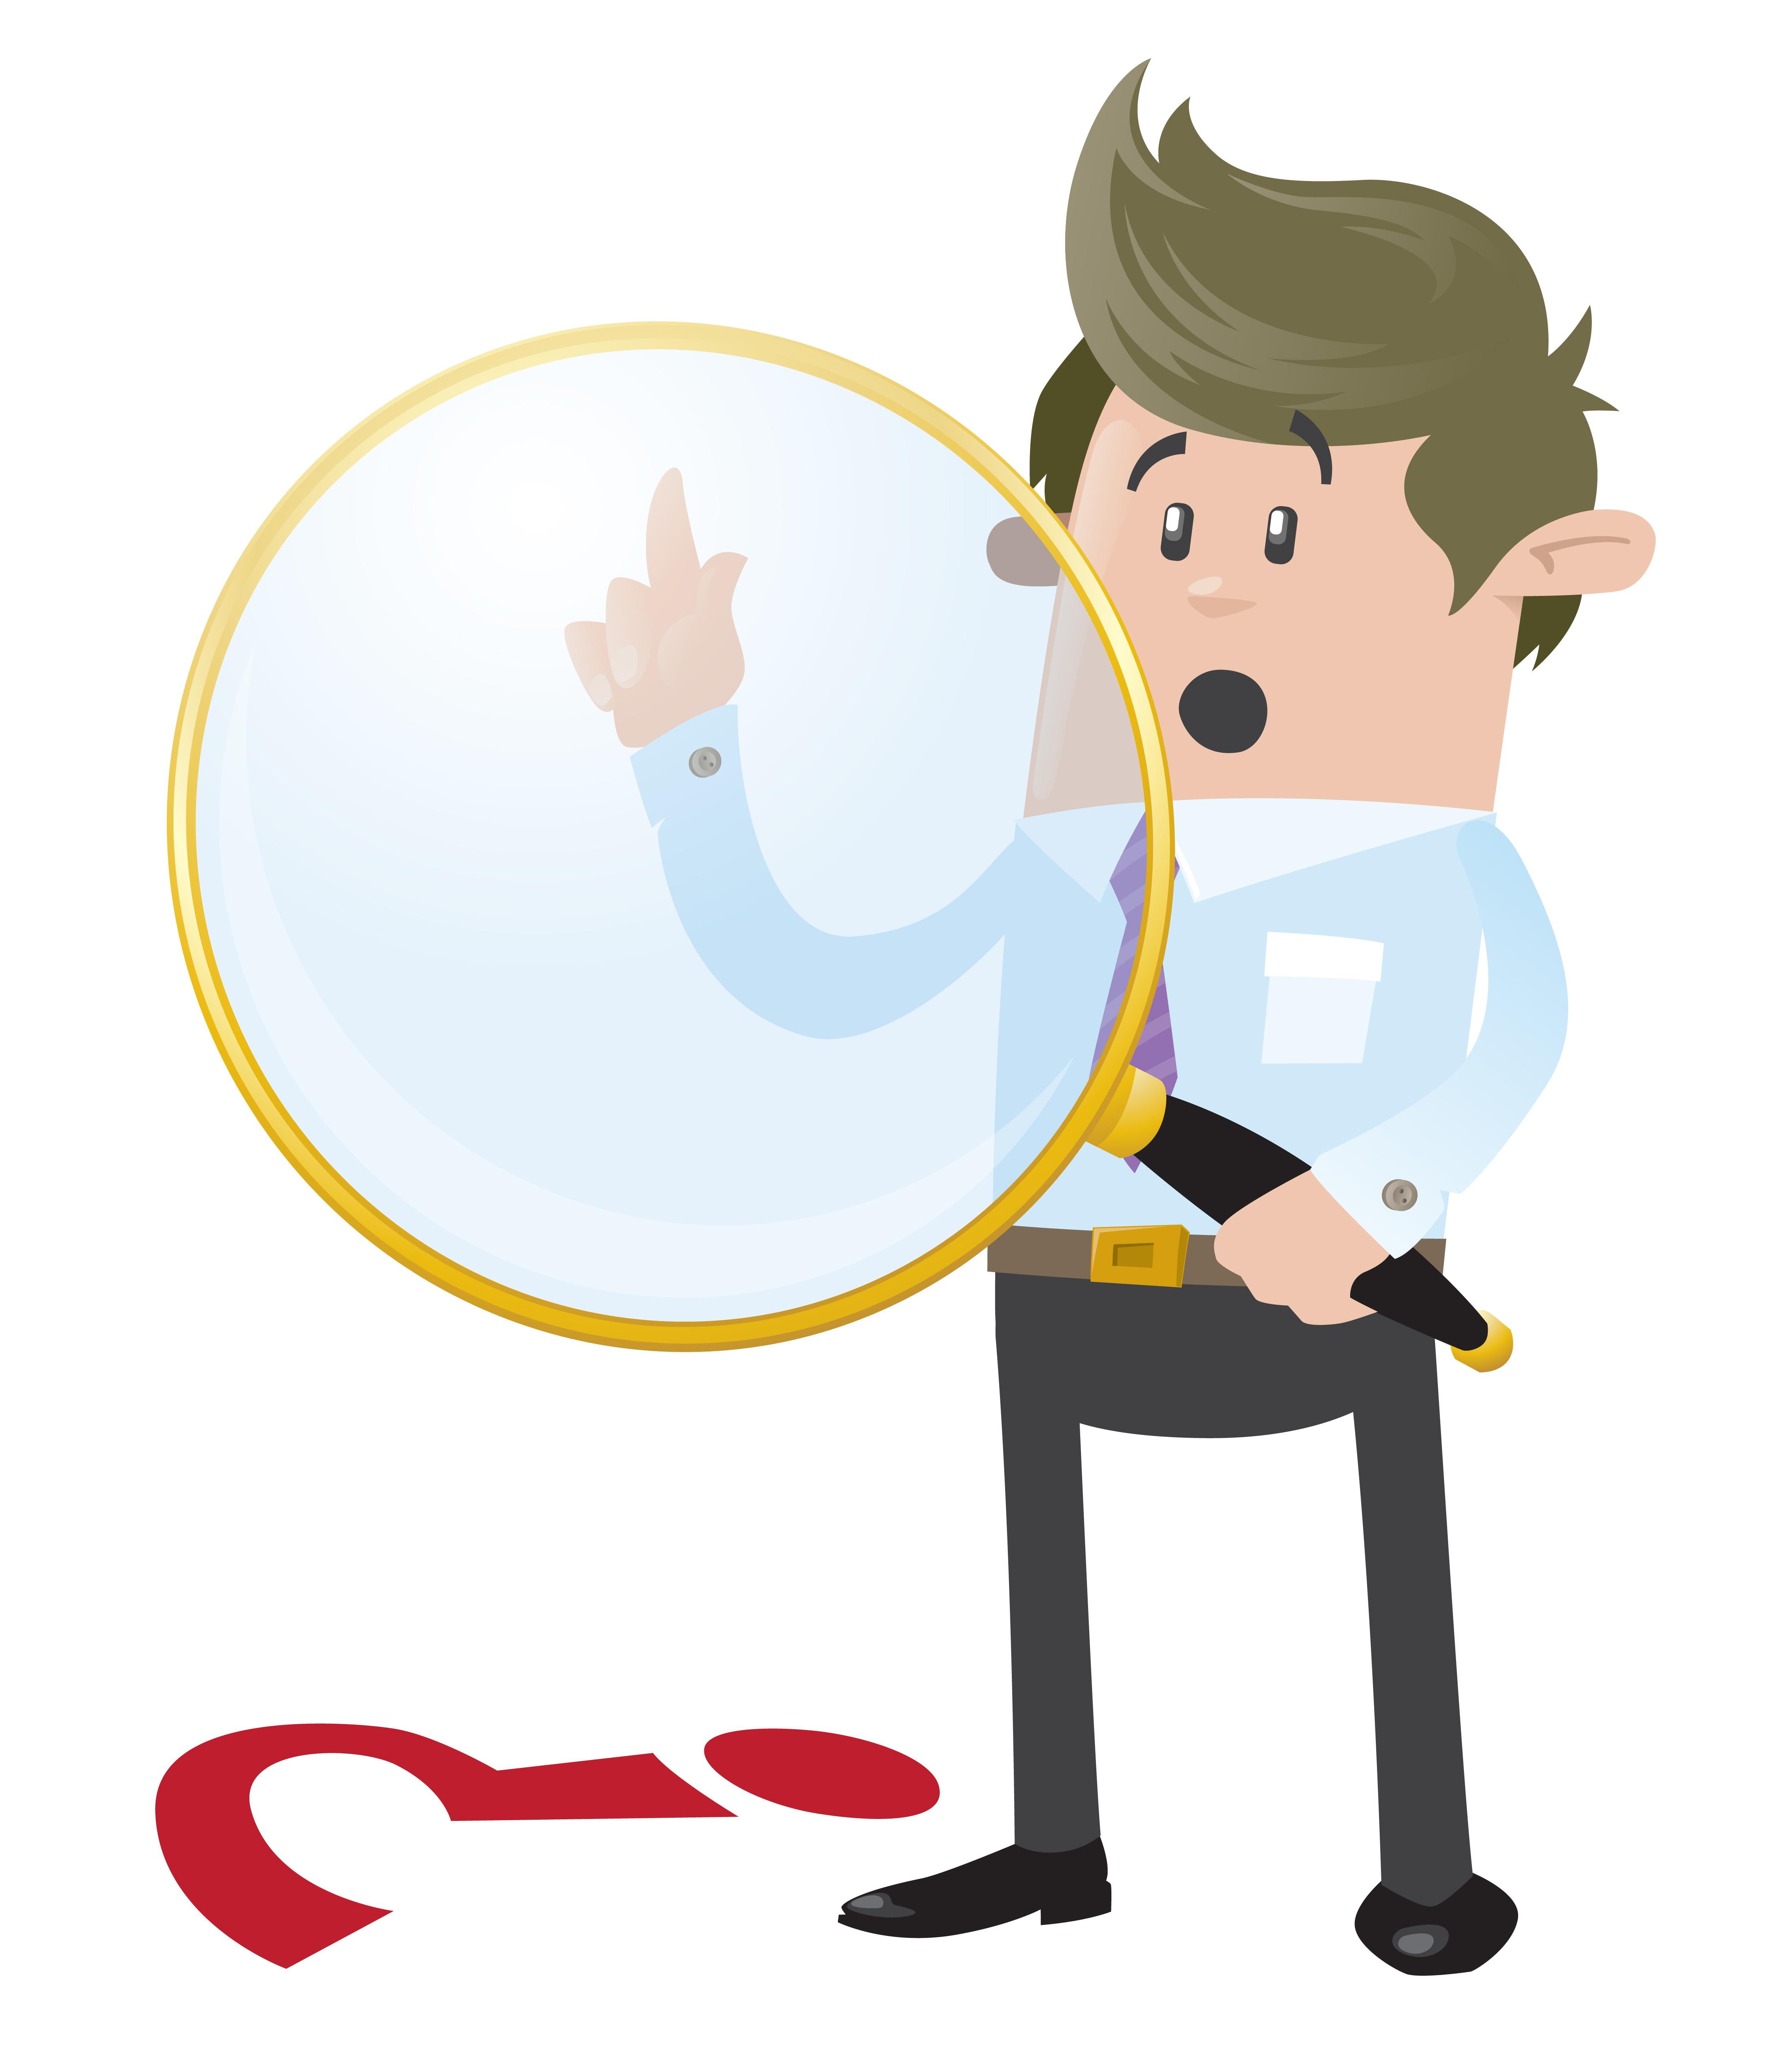 Cqc new fundamental standards. Evidence clipart statement